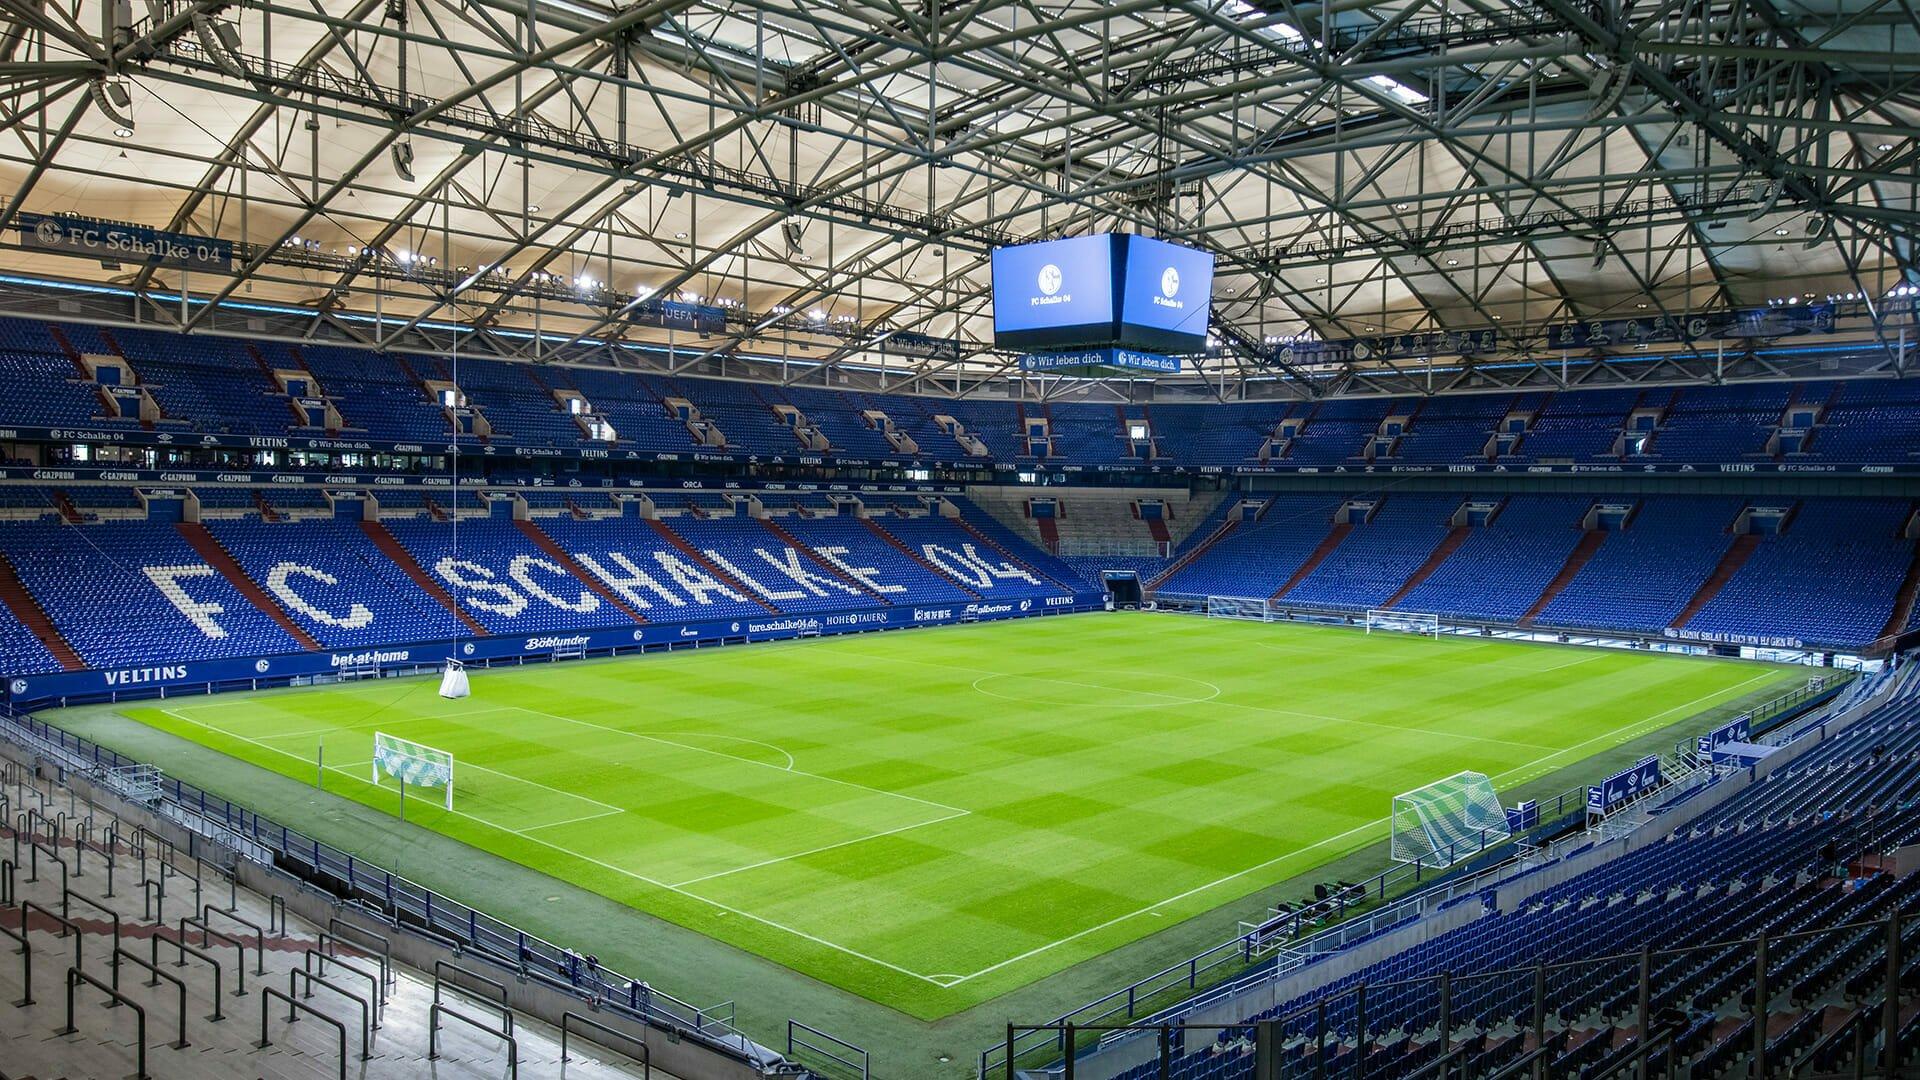 Mengenal Lebih Dekat Klub Schalke 04 8